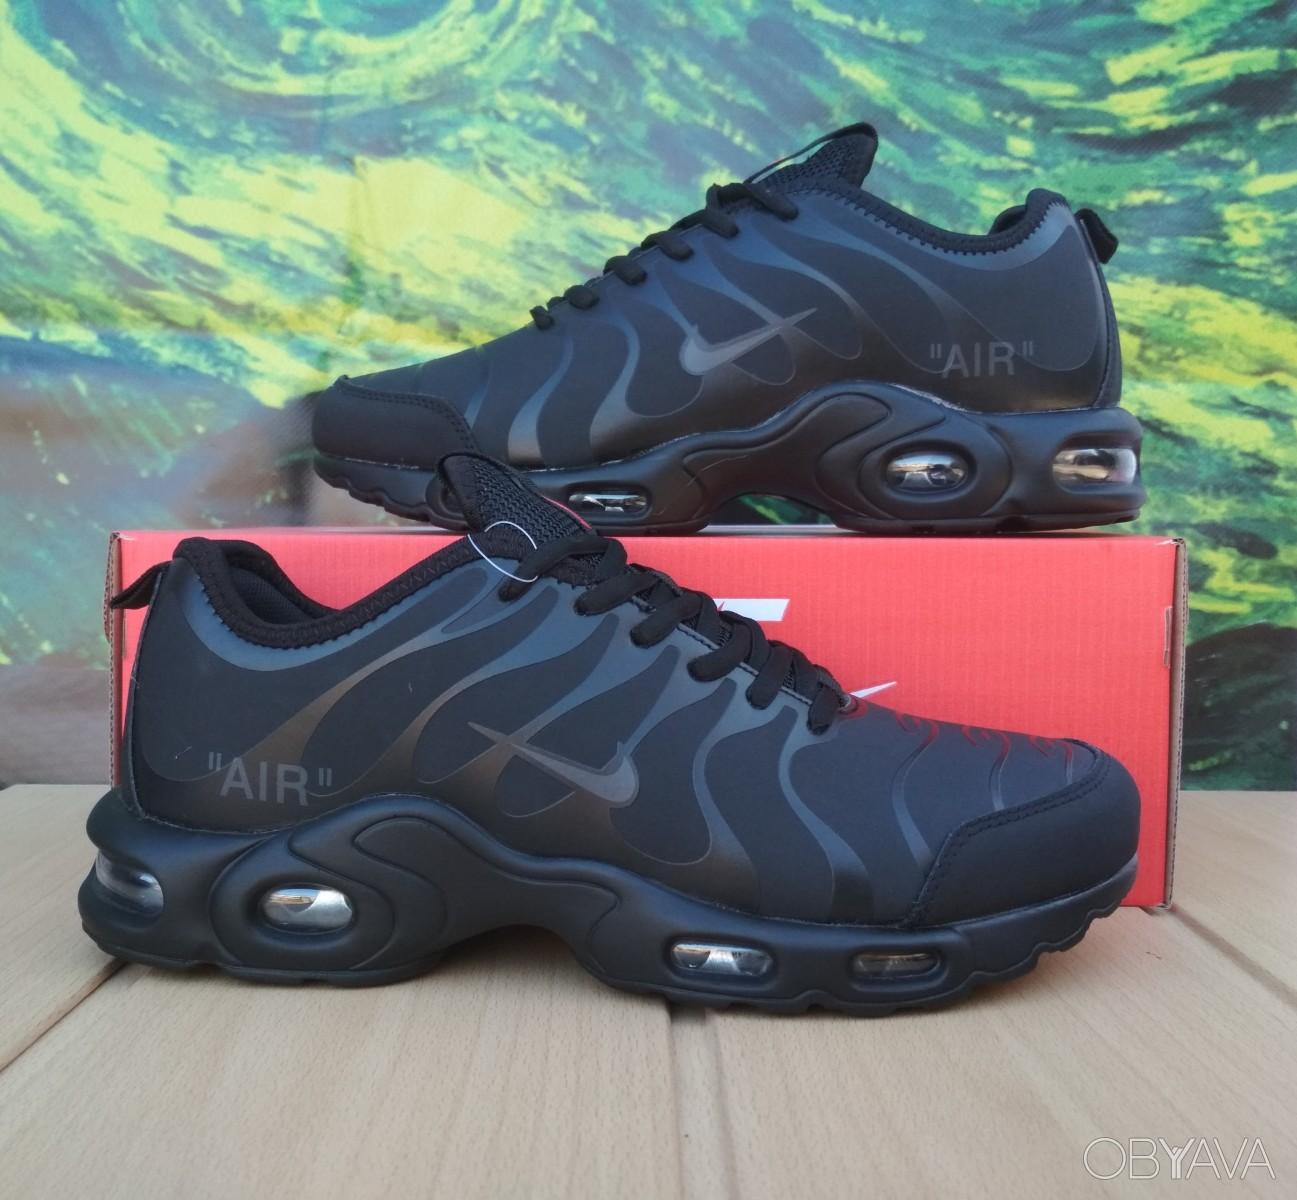 classic fit d49f3 f6a68 ᐈ Кроссовки в стиле Nike Air Max 95 Tn Plus all black ᐈ Запорожье 1200 ГРН  - OBYAVA.ua™ №2171564